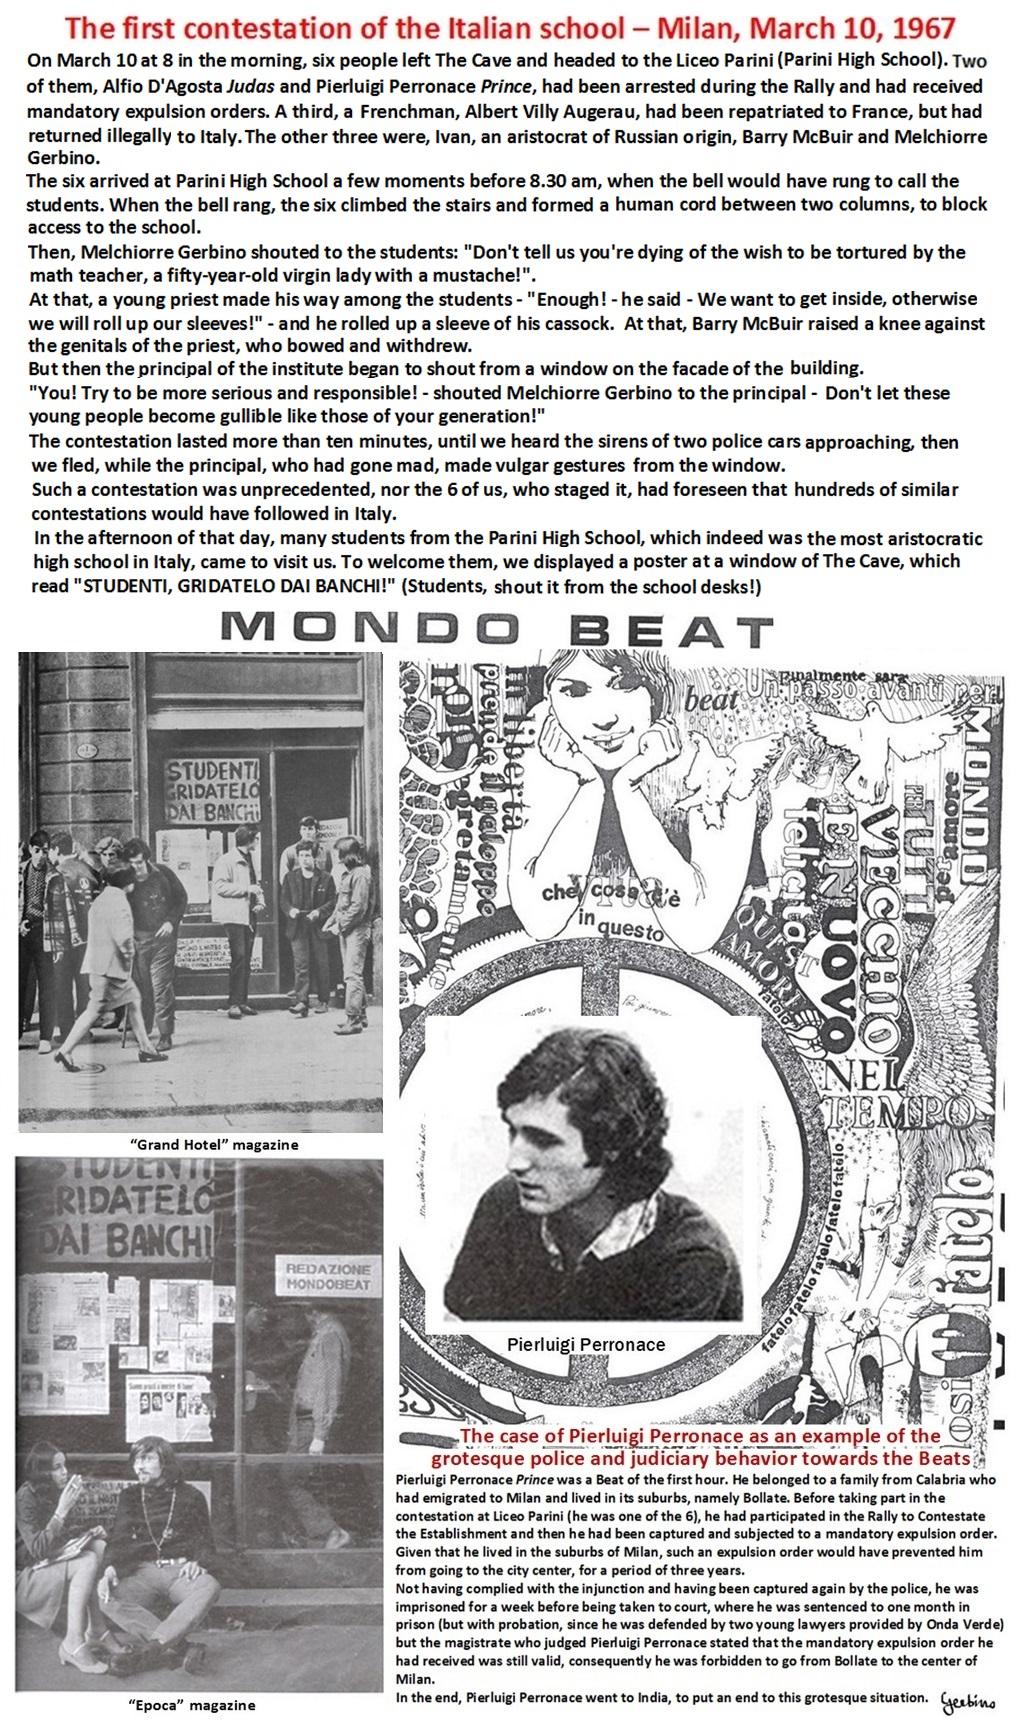 The case of Pierluigi Perronace as an example of the grotesque police and judiciary behavior towards the Beats